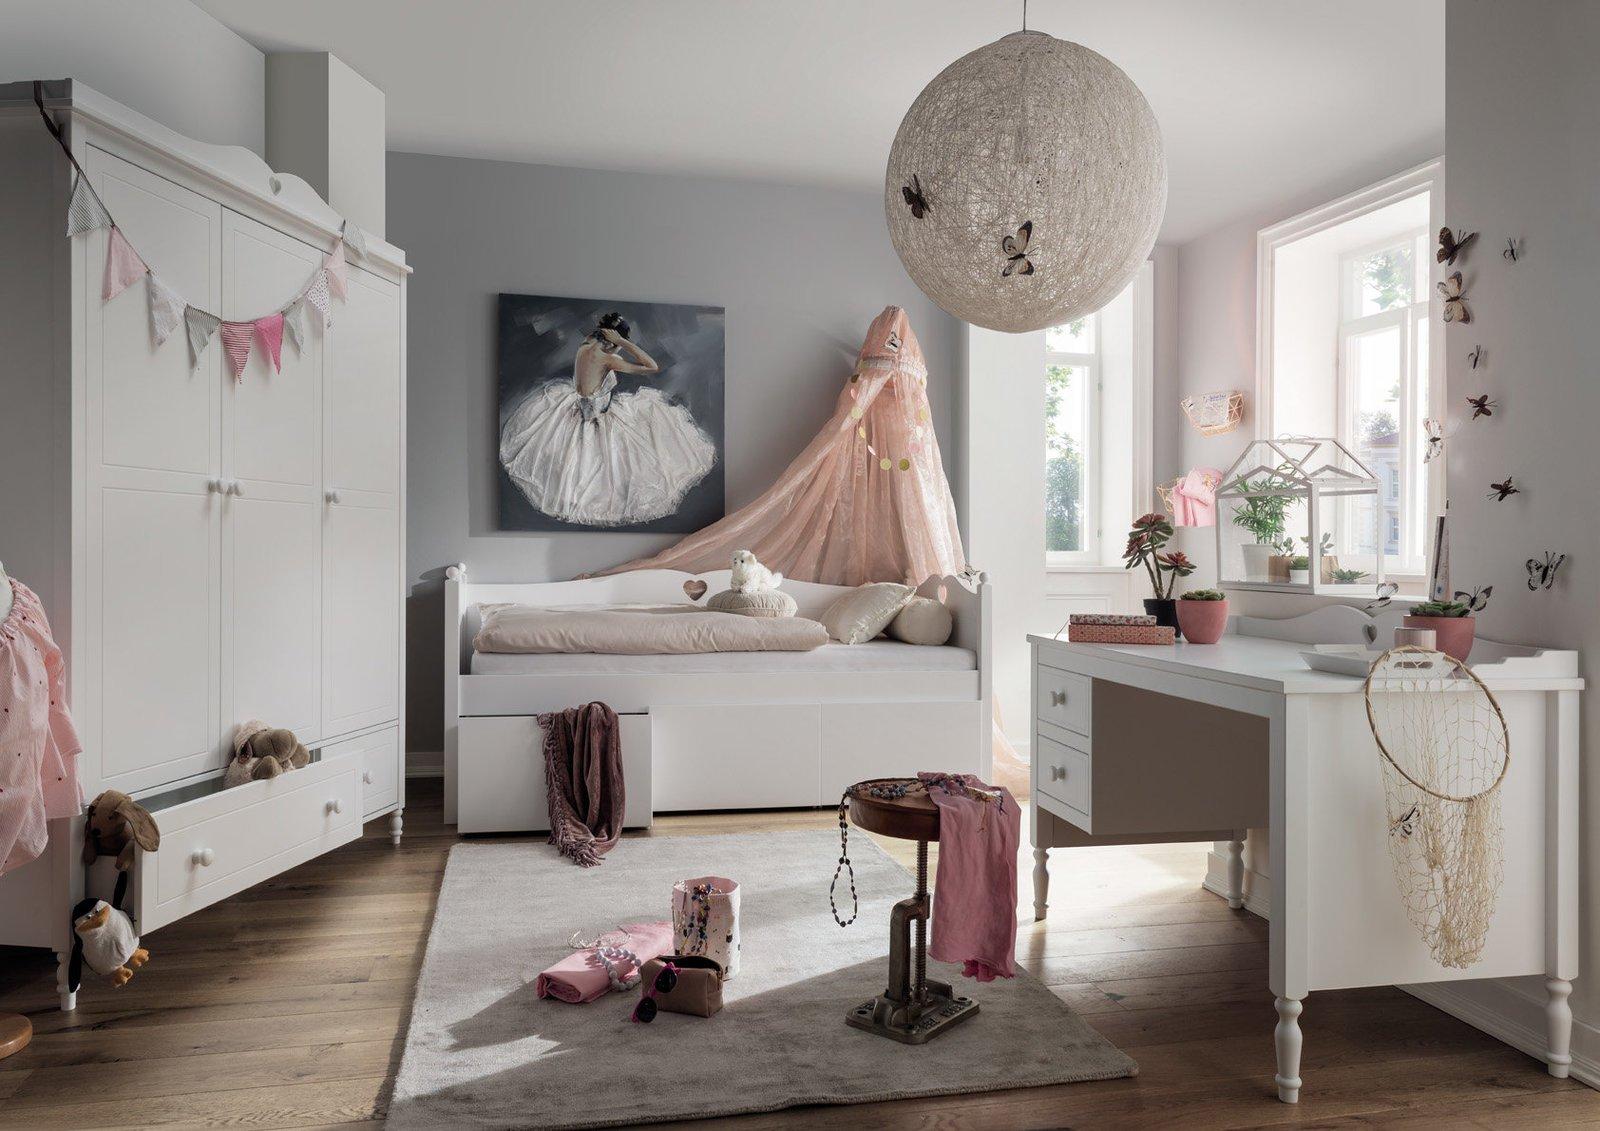 InfansKids Babyzimmer Emma, Bild 3